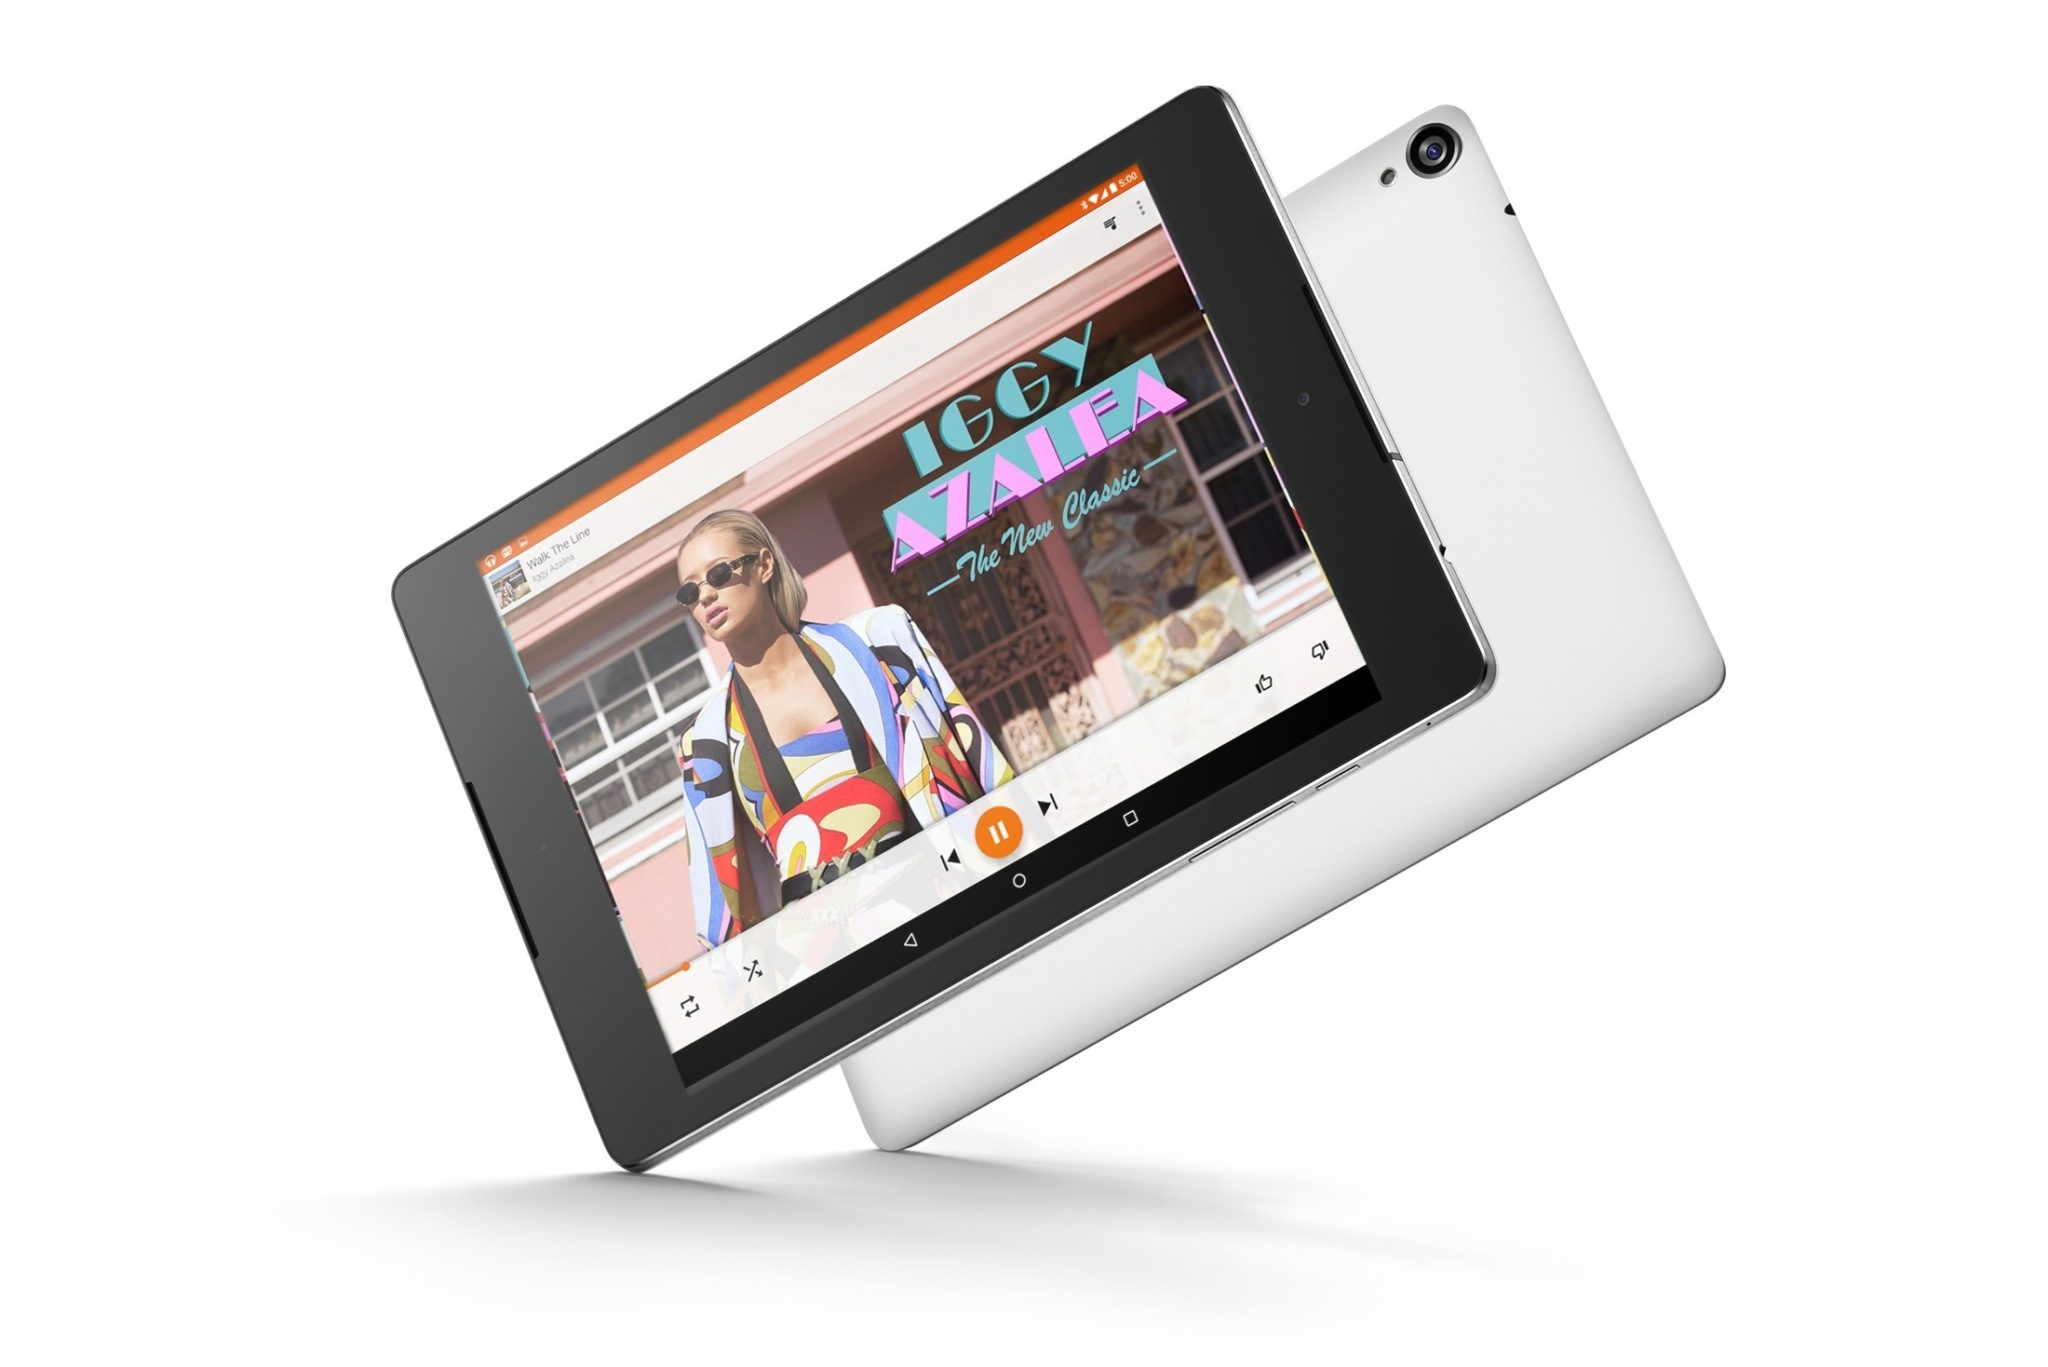 Google Nexus 91 is selling the Nexus Nexus Player 9 and on Google Play